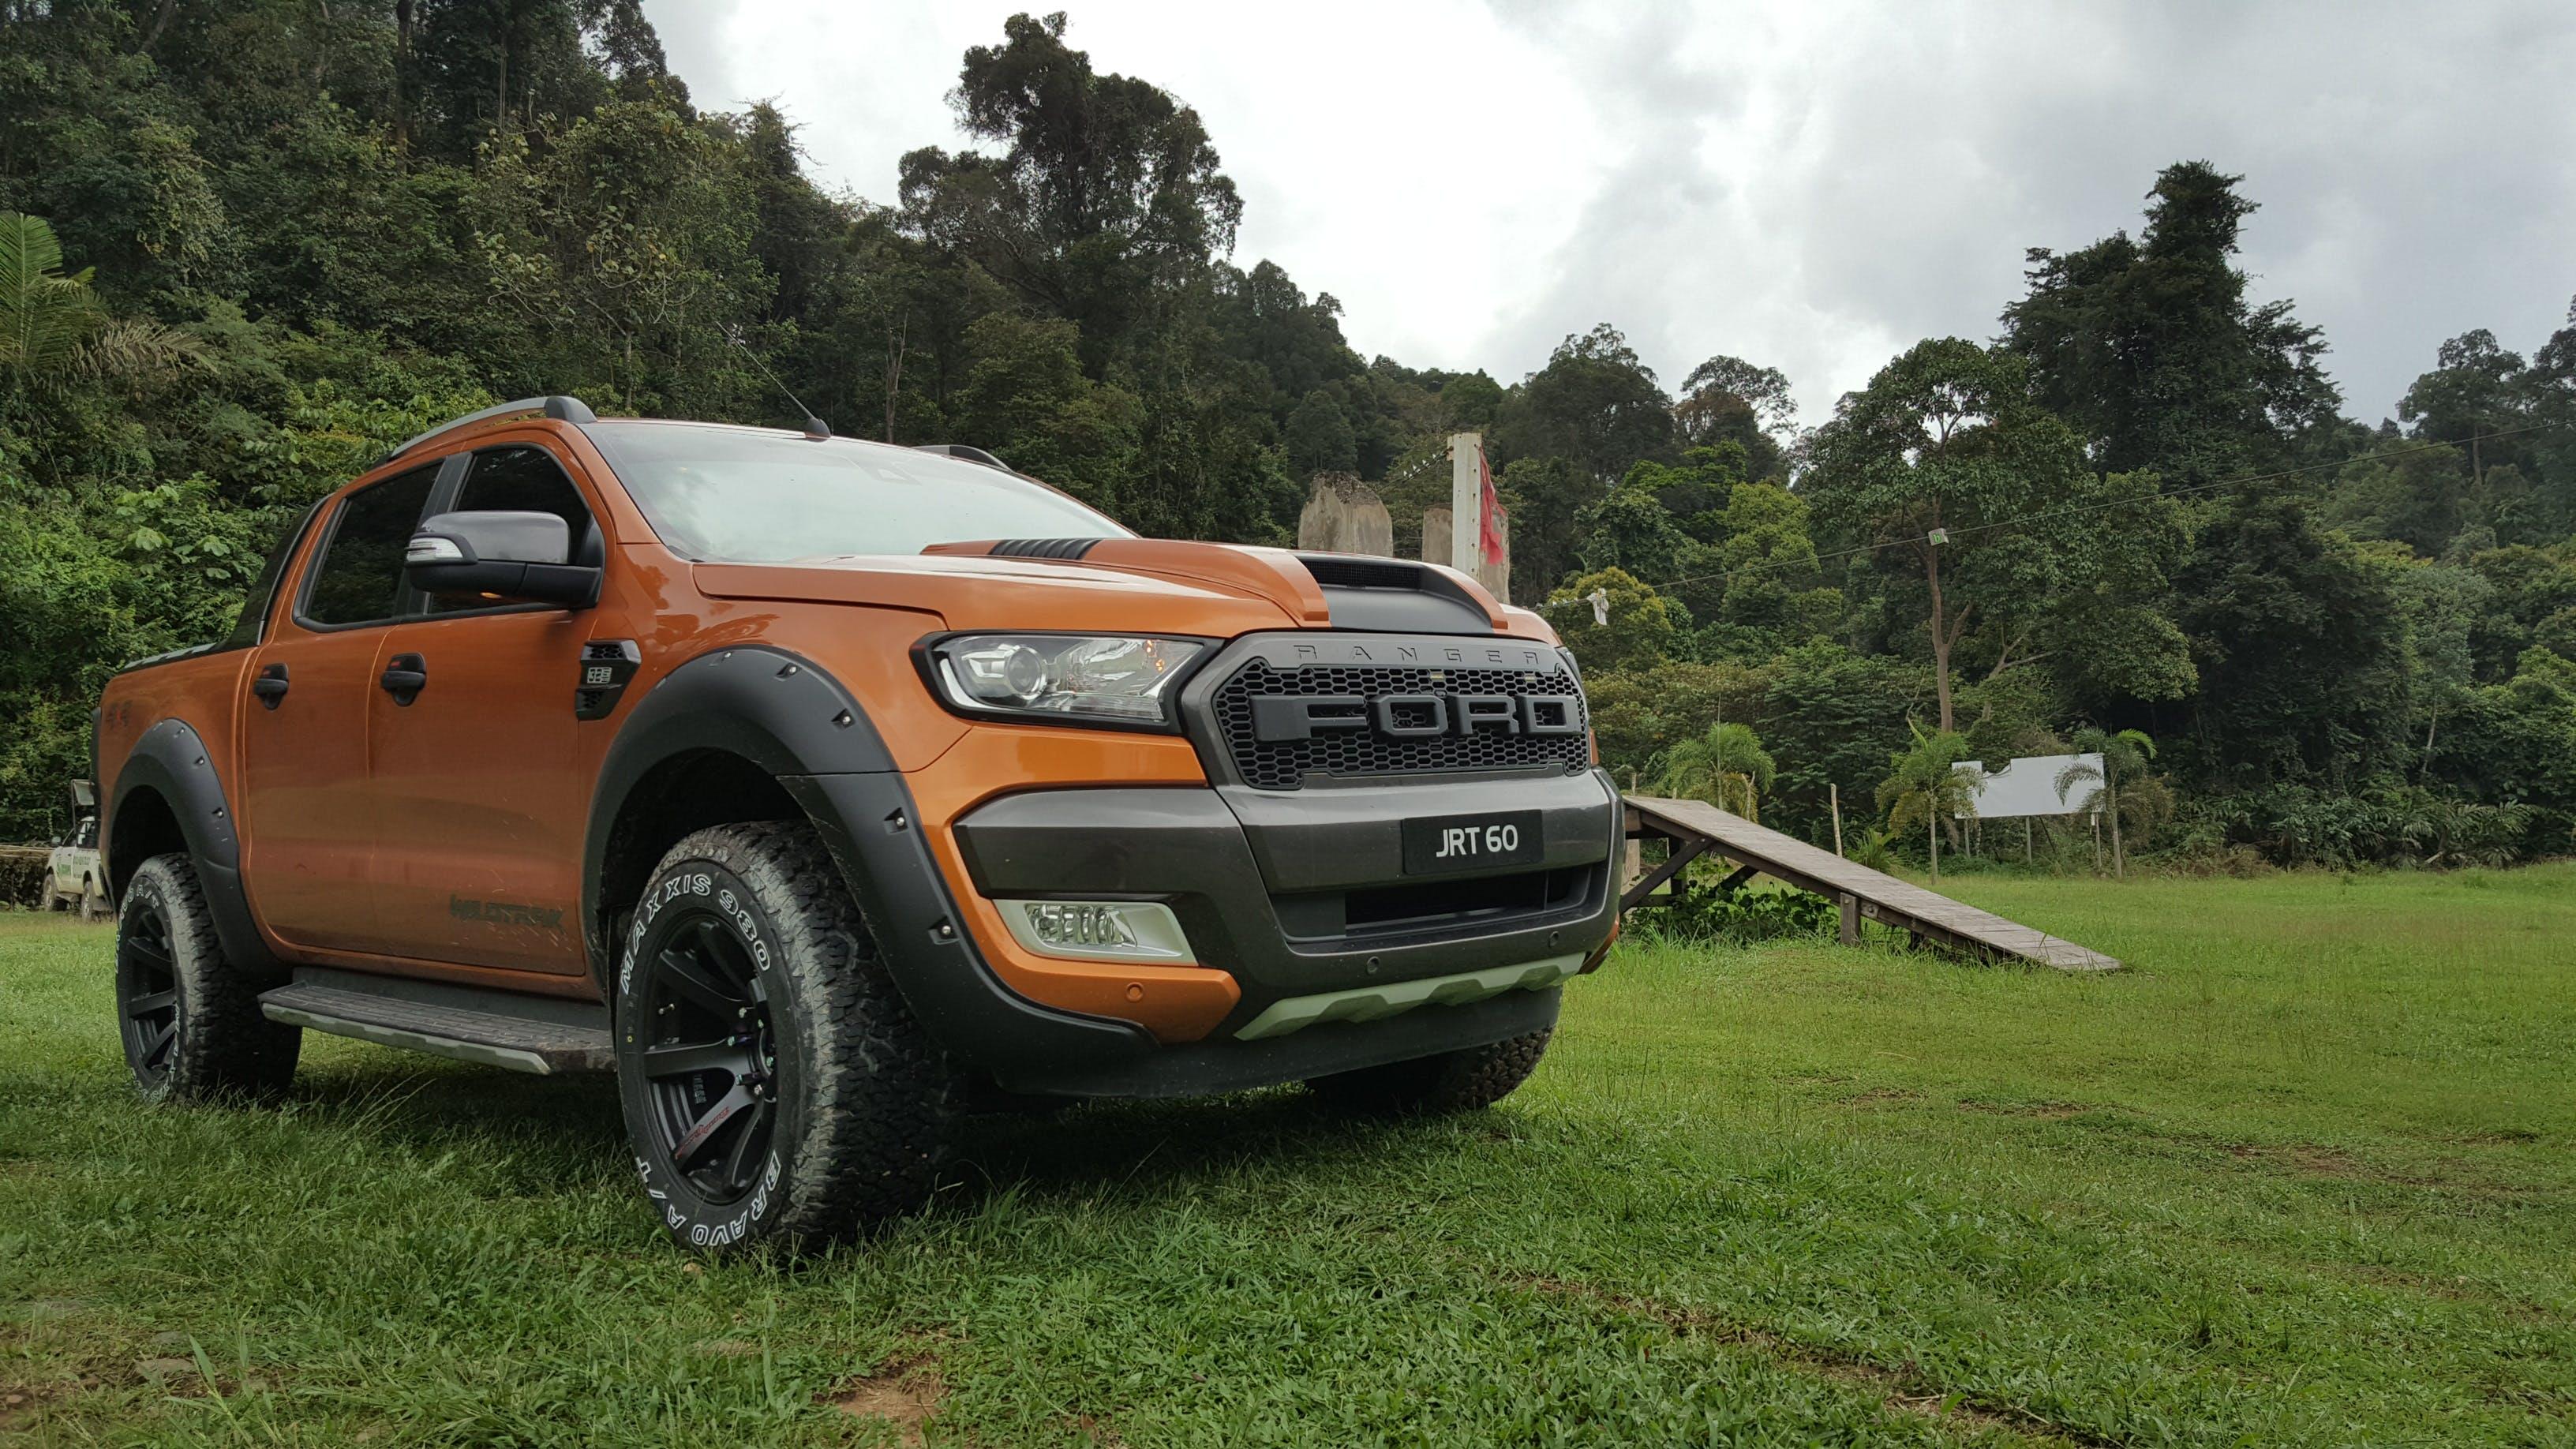 Free stock photo of car, desktop backgrounds, ford ranger, forest